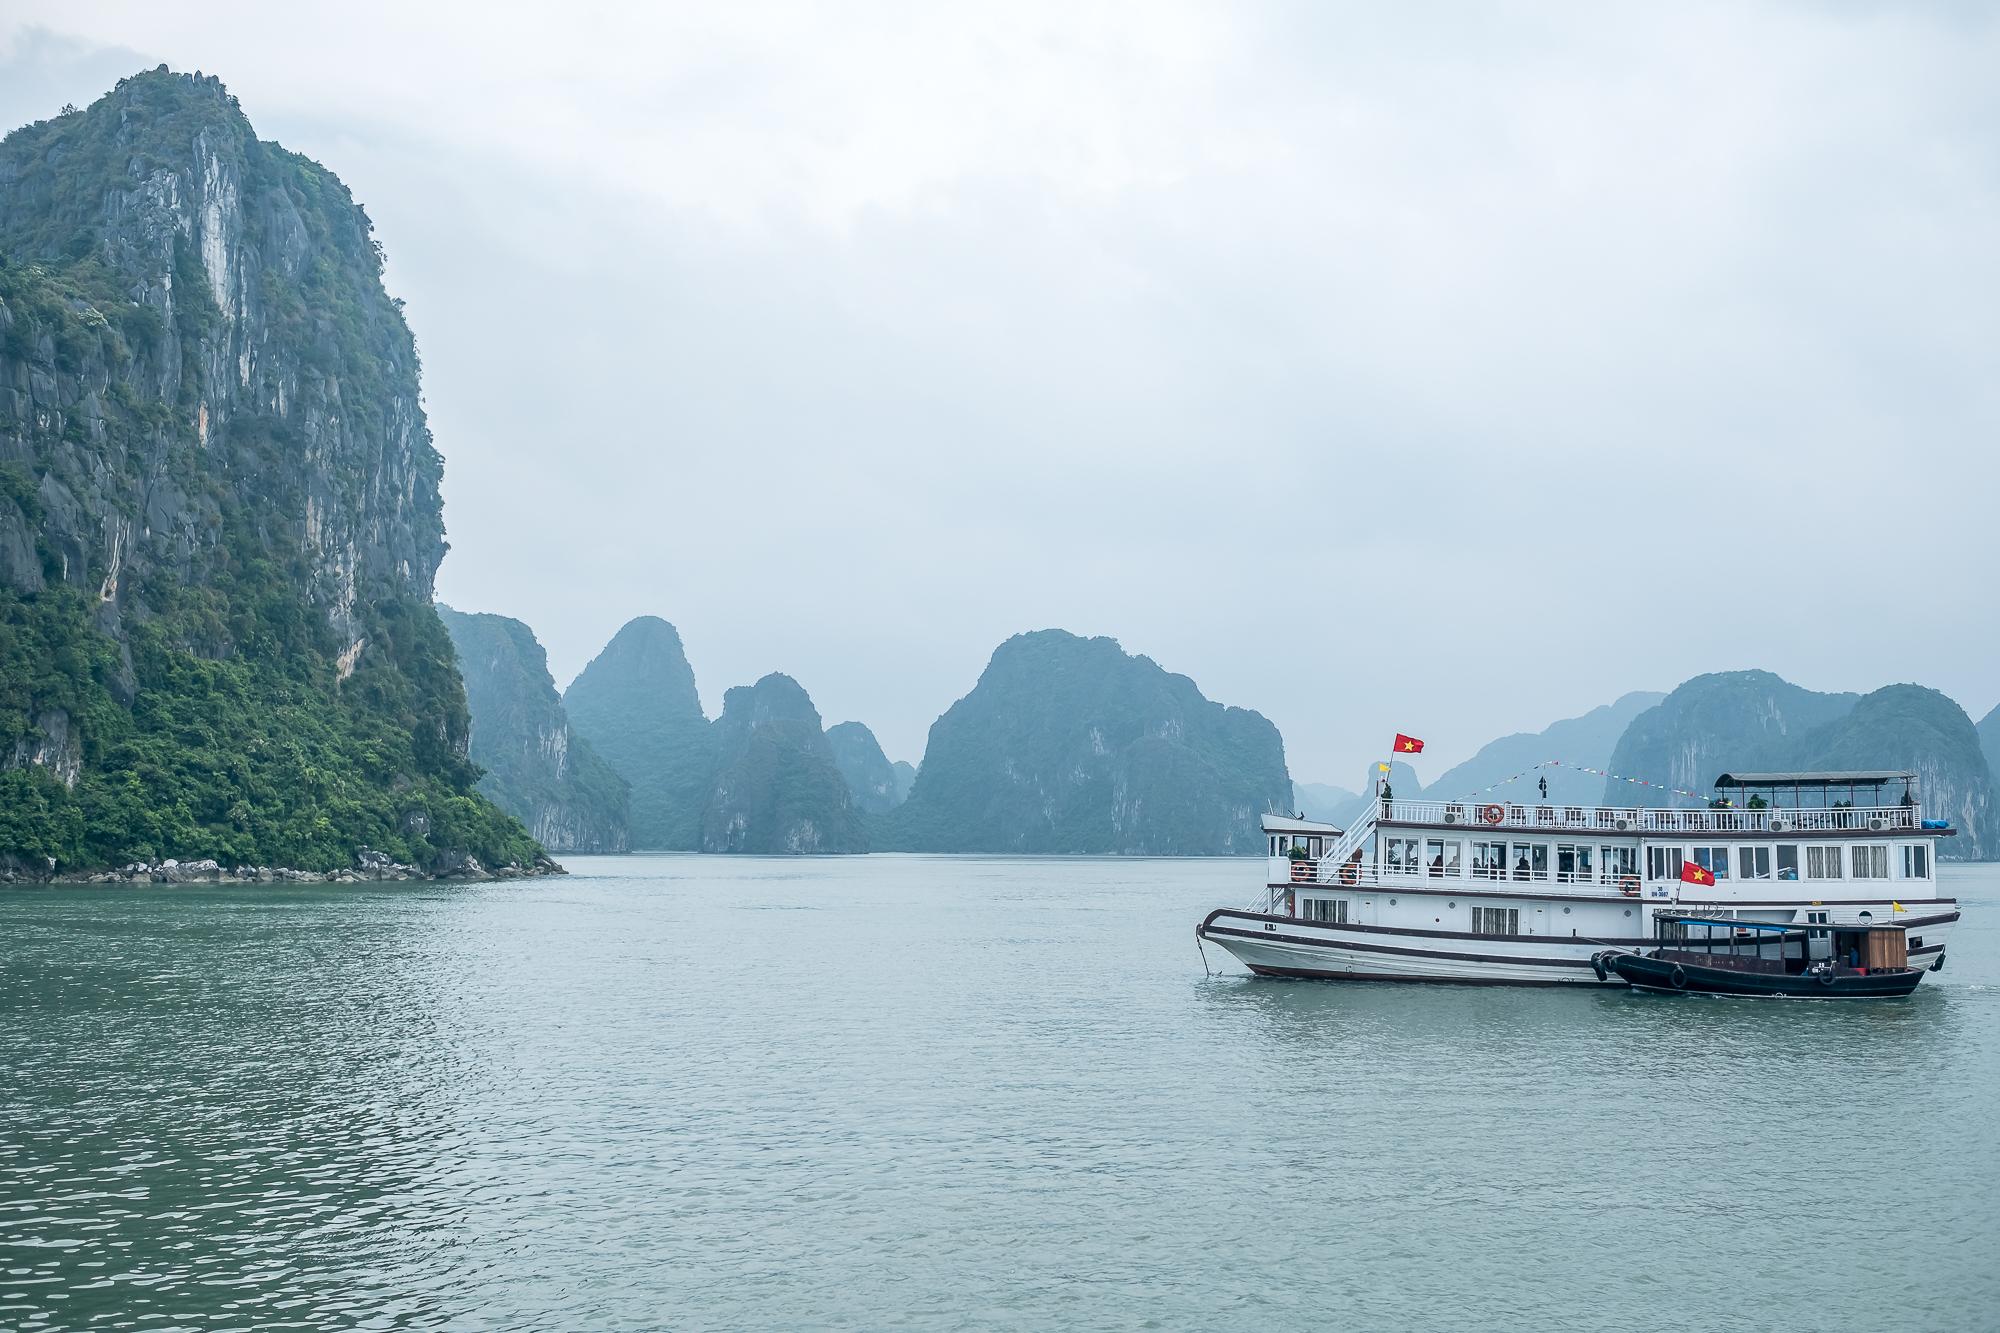 Vietnam_Honeymoon_TheOutsiderBlog_DSCF8206.JPG